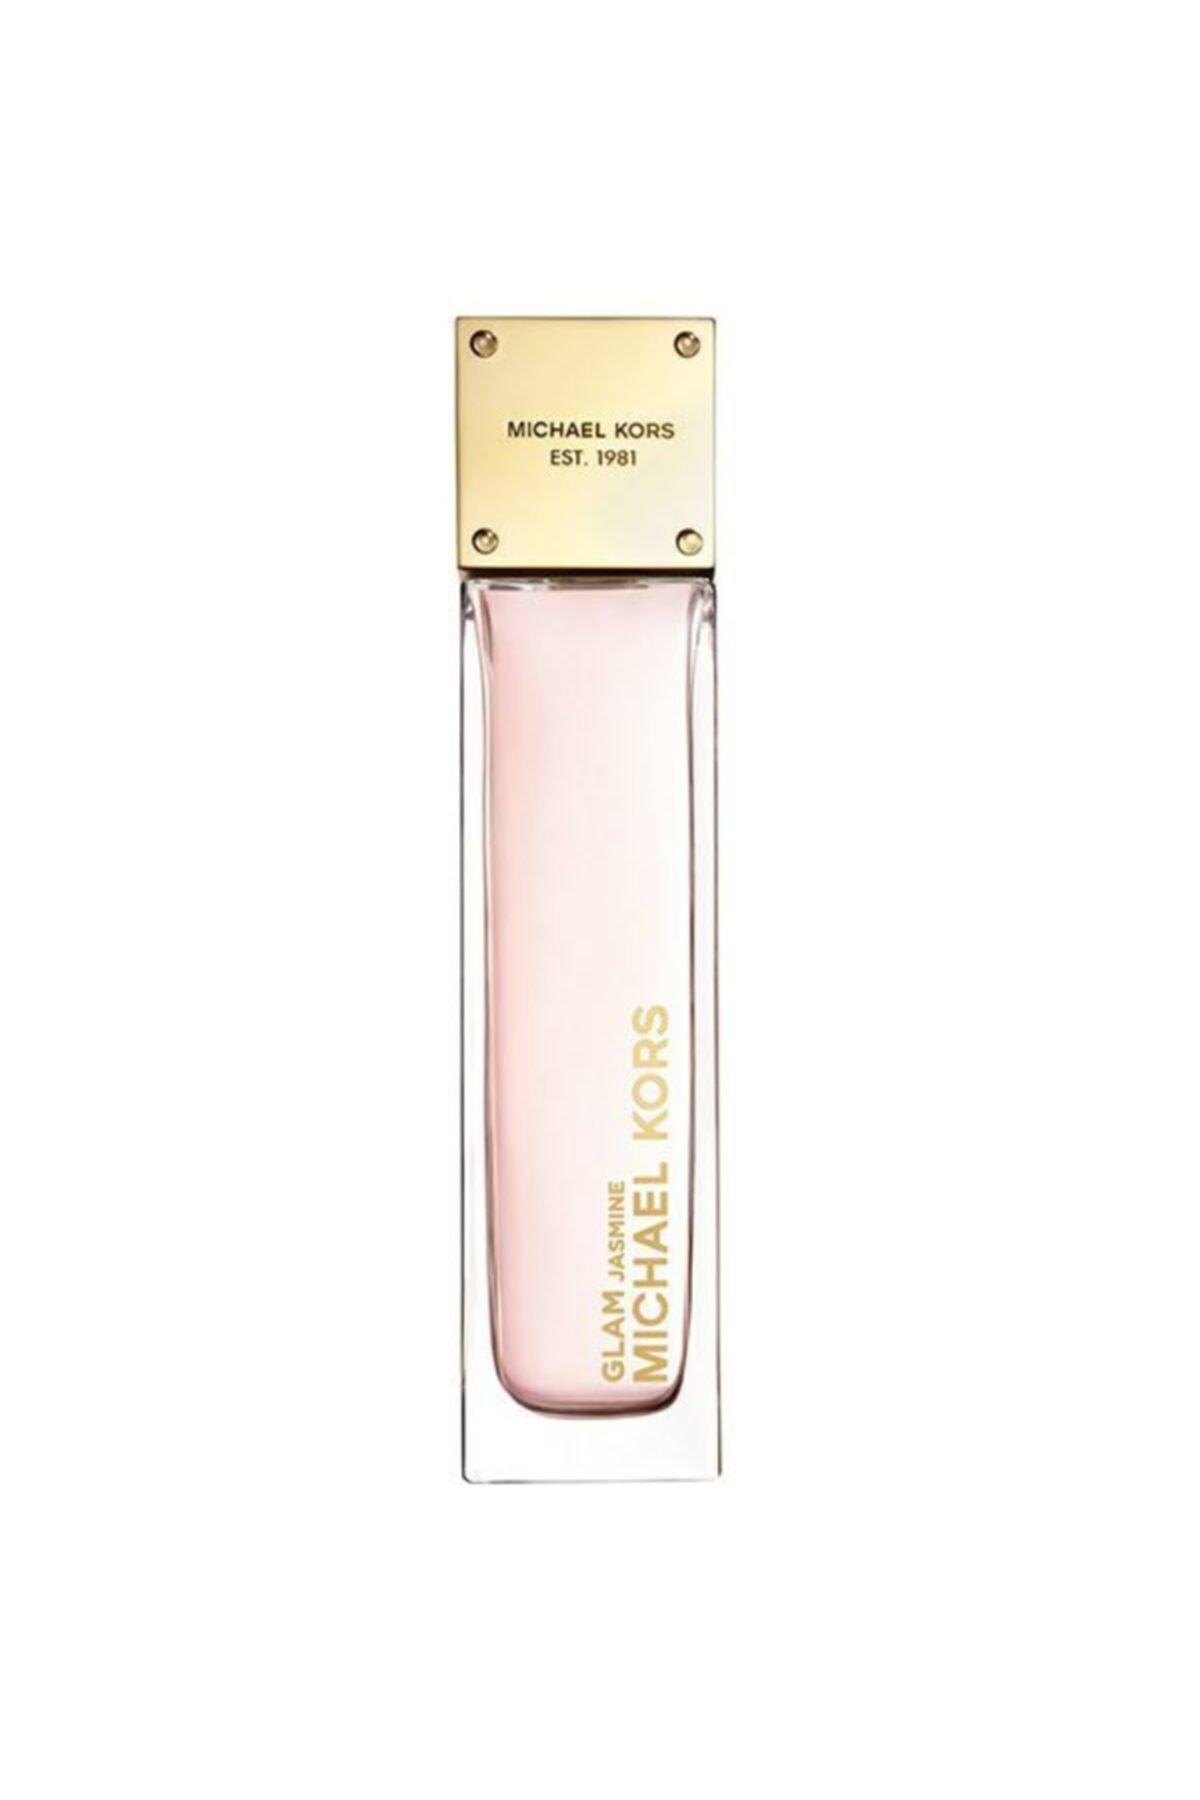 Michael Kors Glam Jasmine Edp 100 ml Kadın Parfüm 022548289716 1